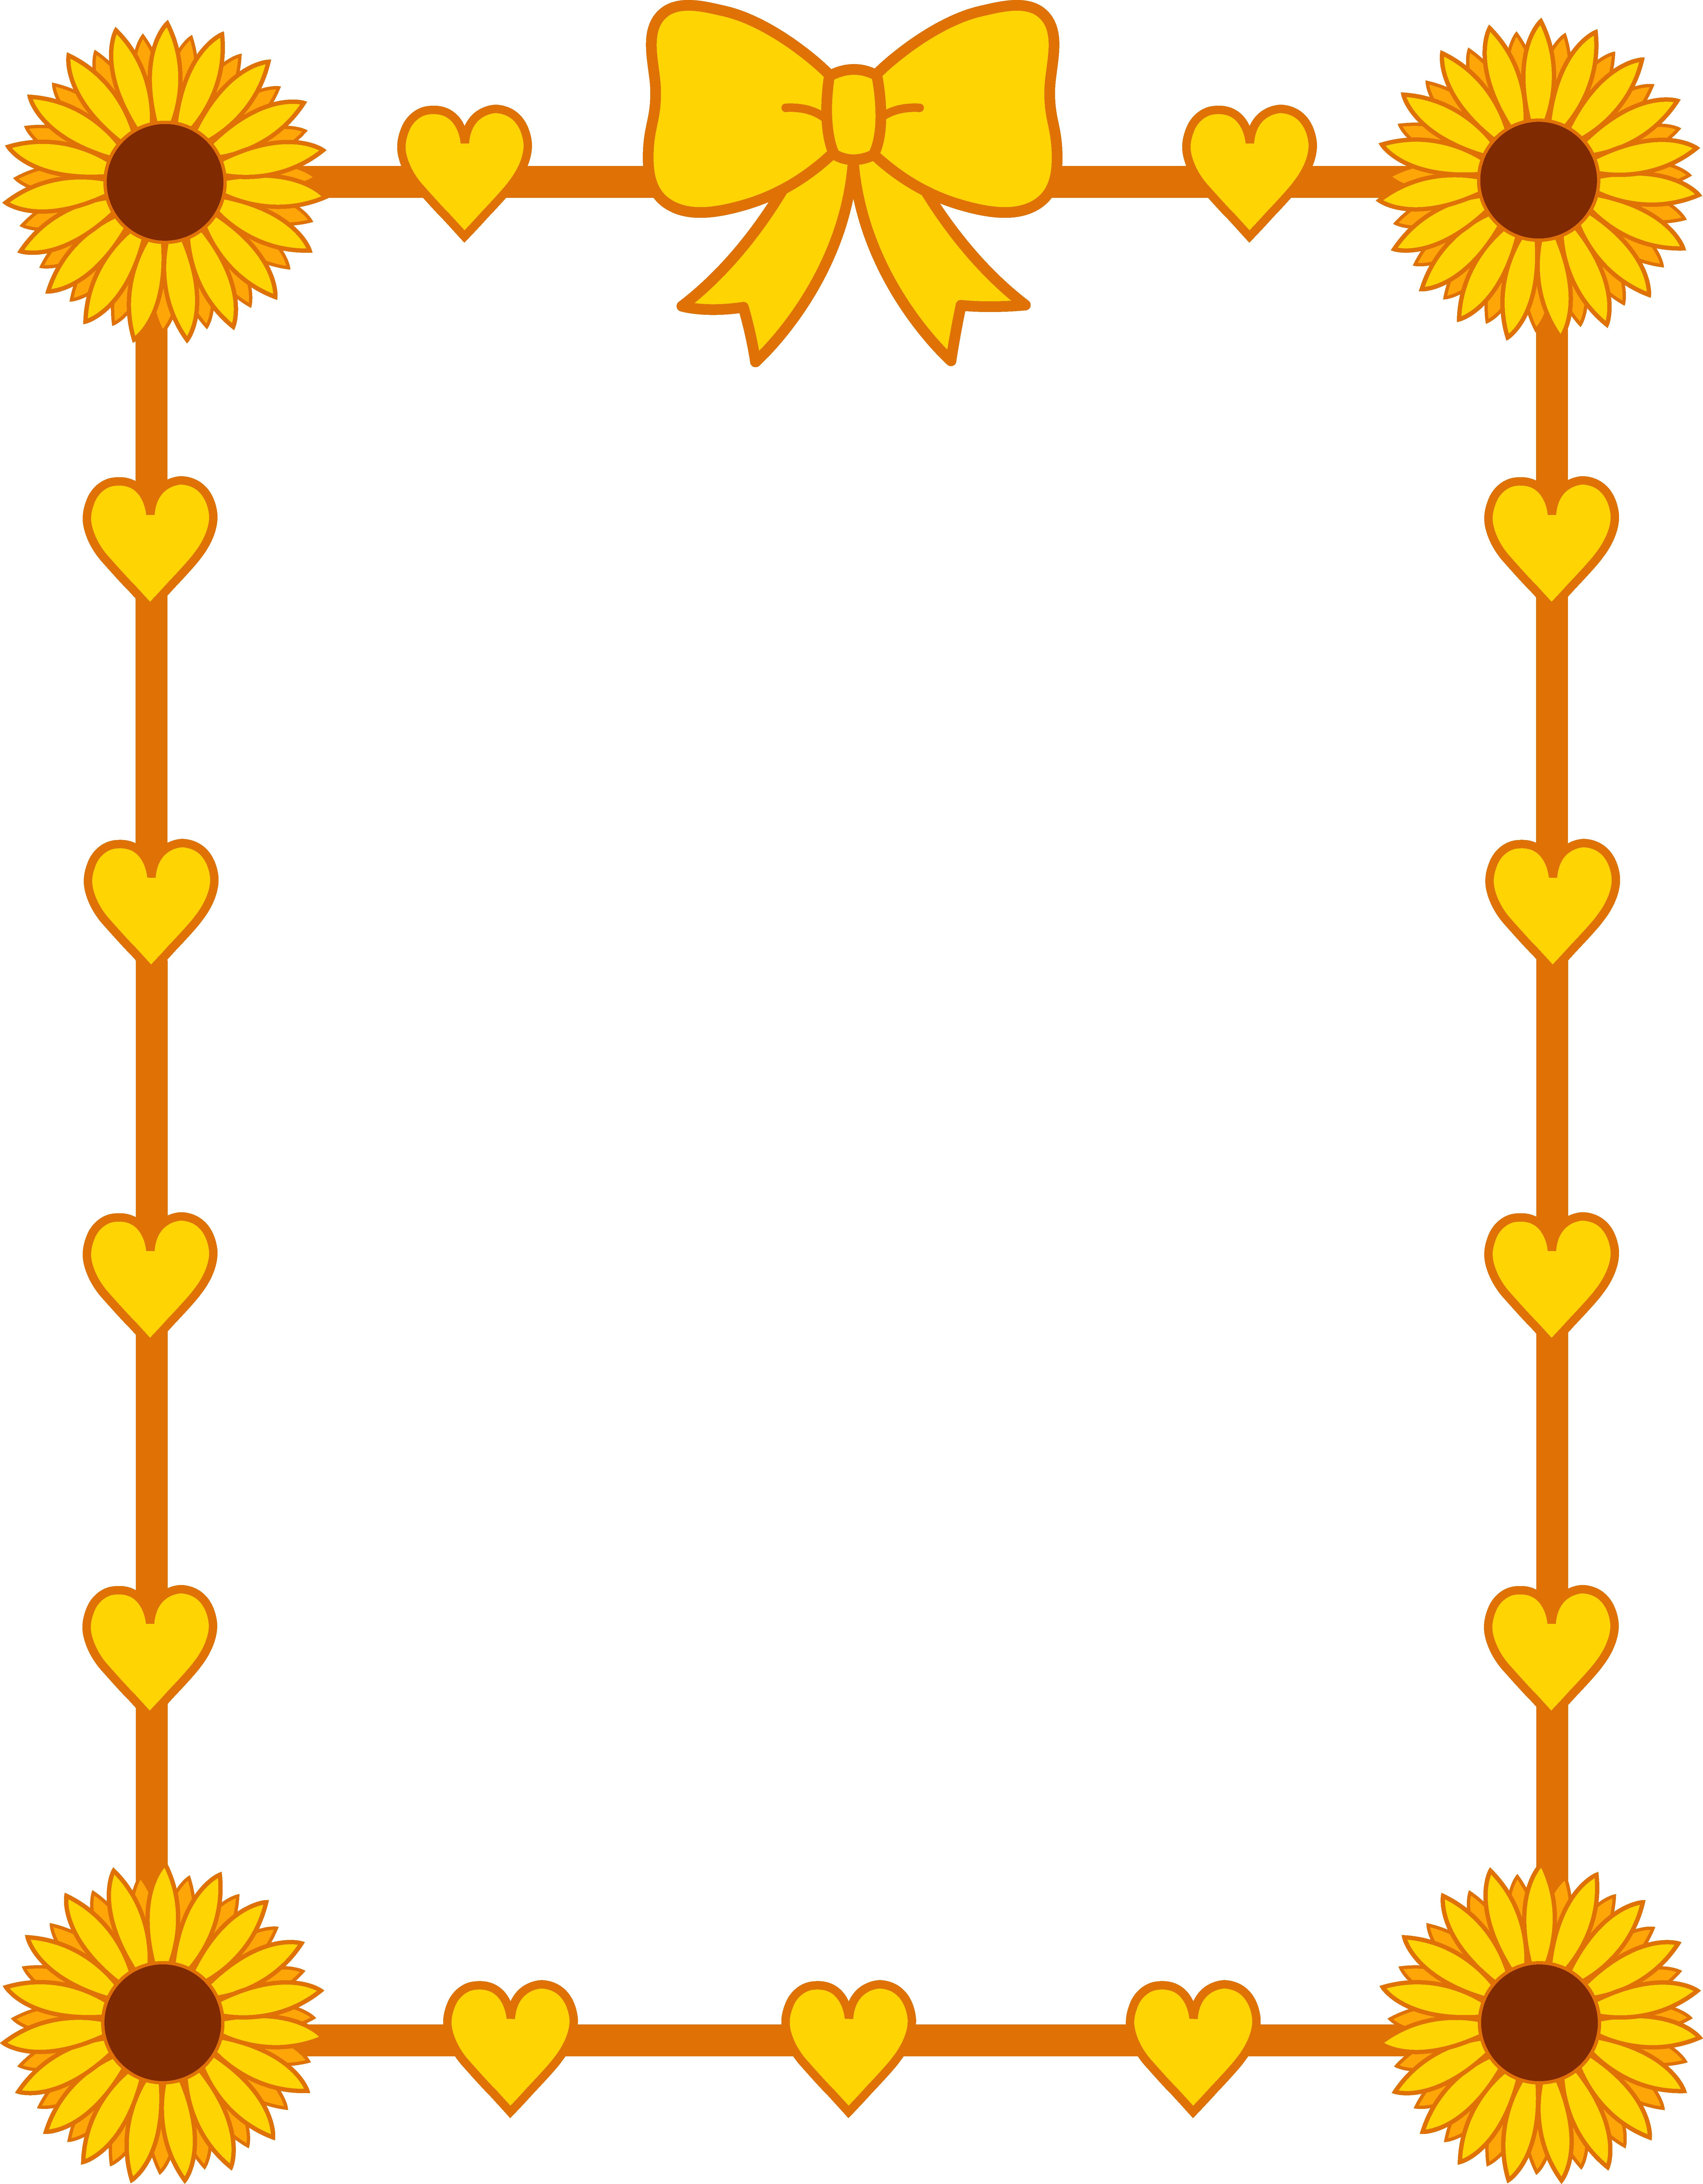 sunflower_yellow_hearts_frame